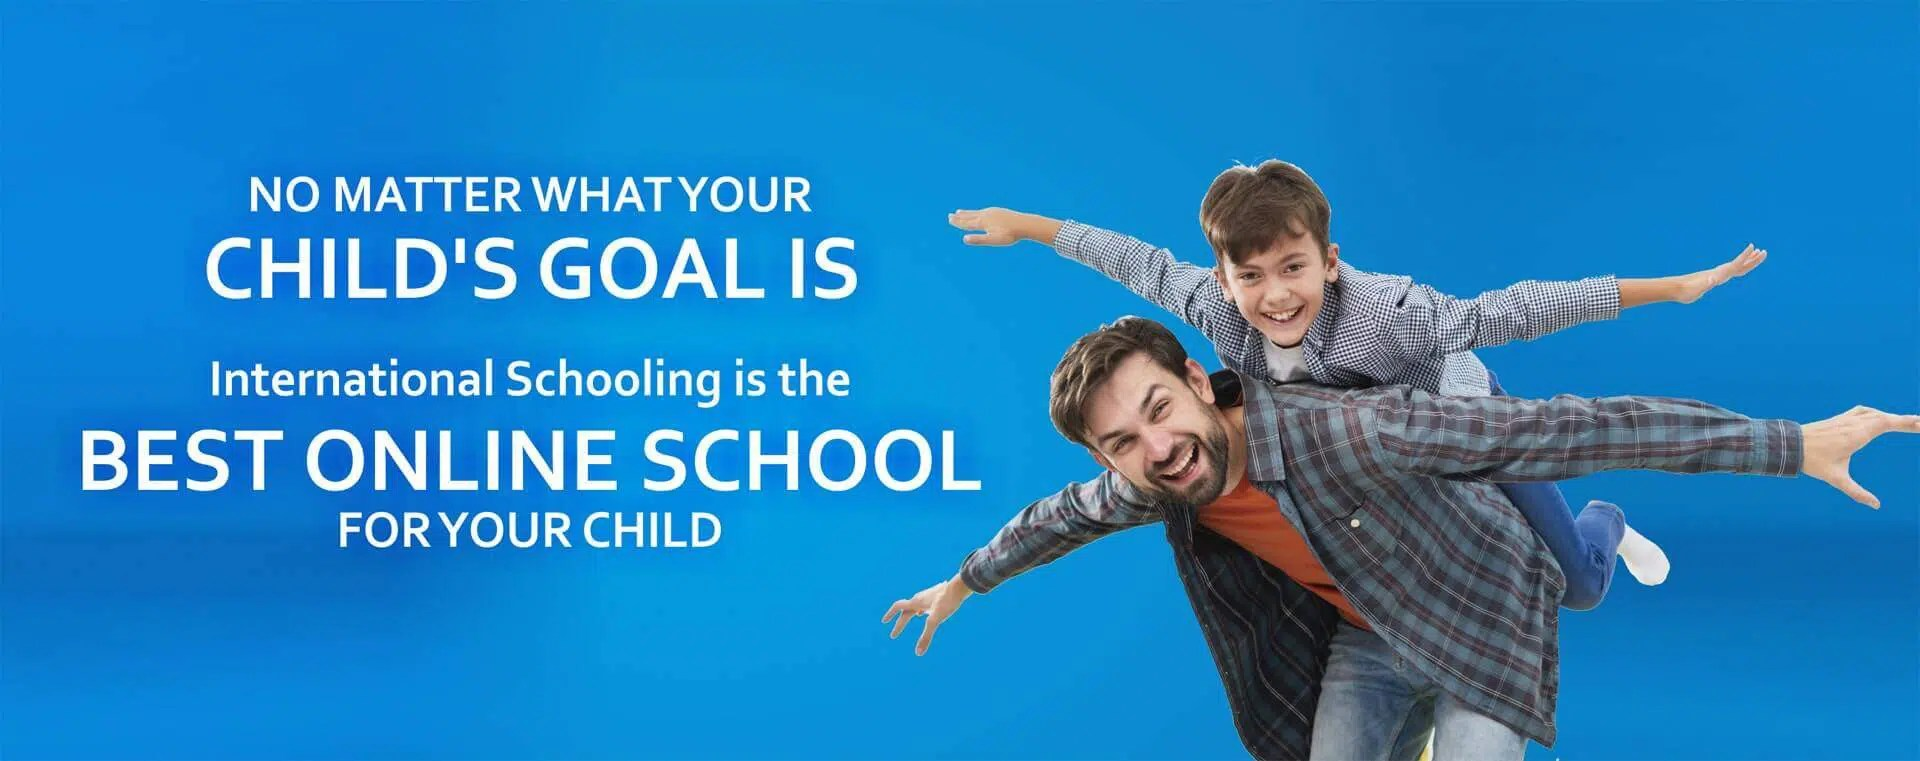 child's goal